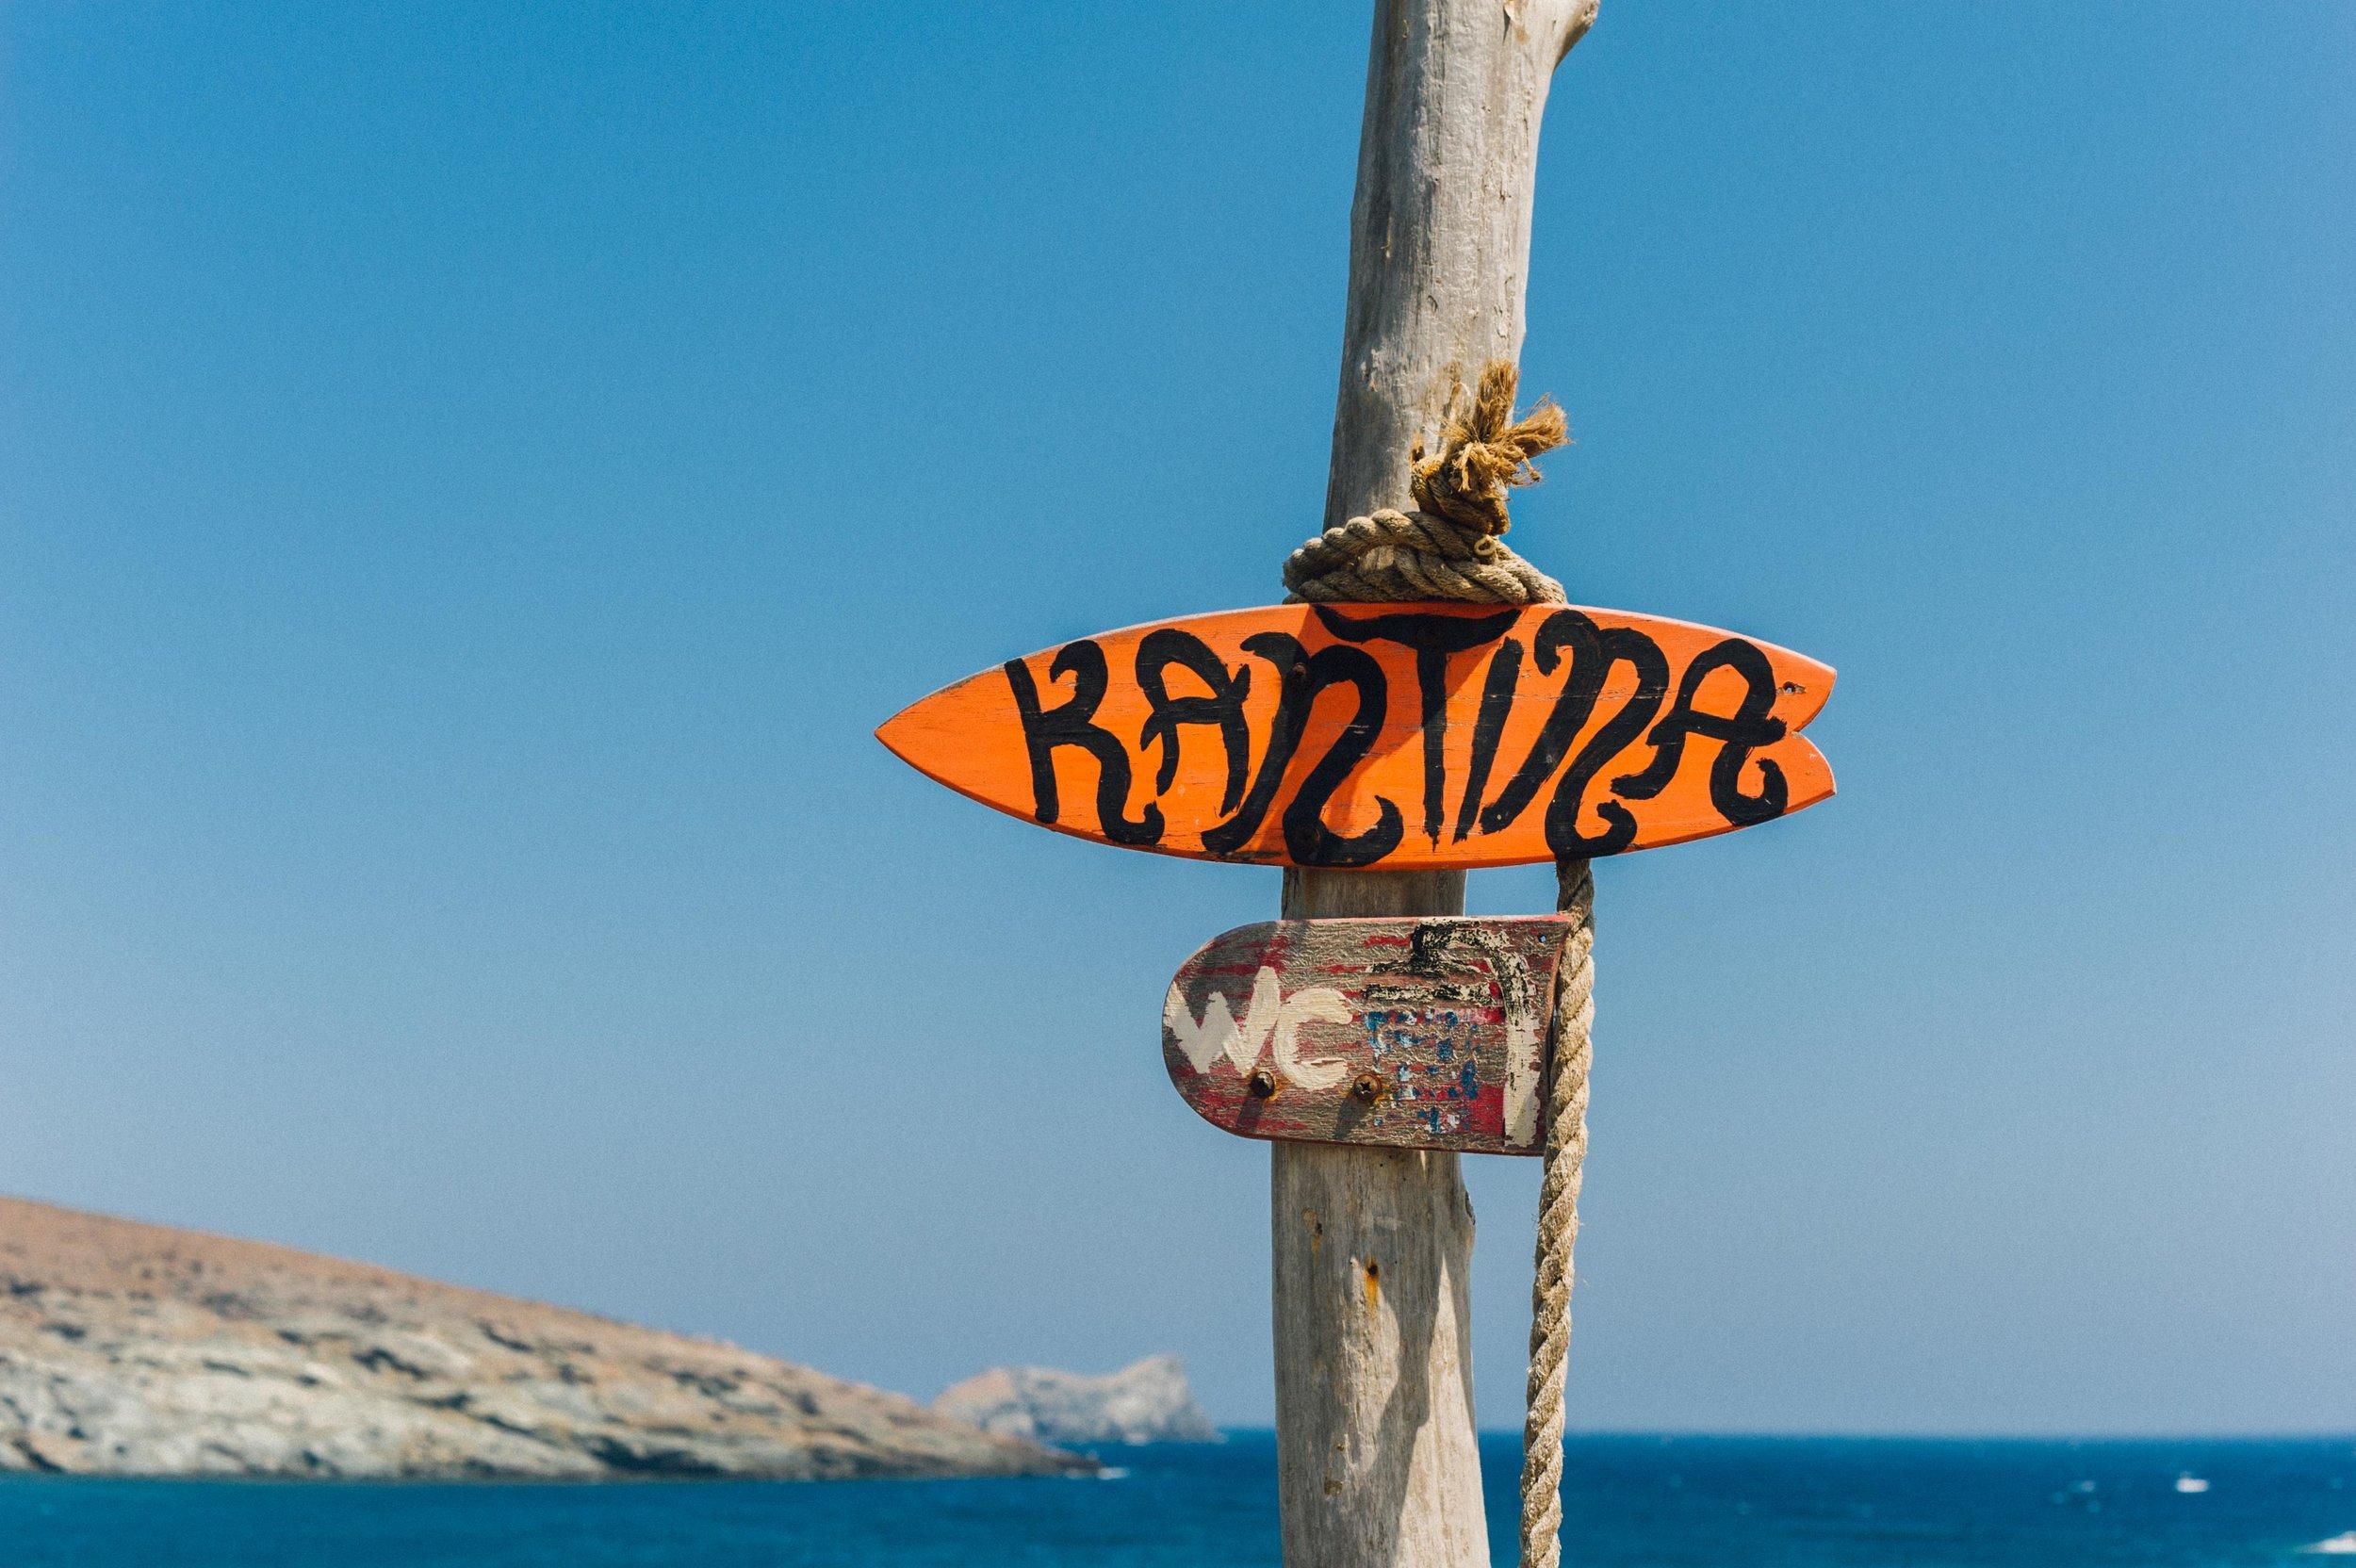 Surfing in Greece - Kolimbithra, Tinos